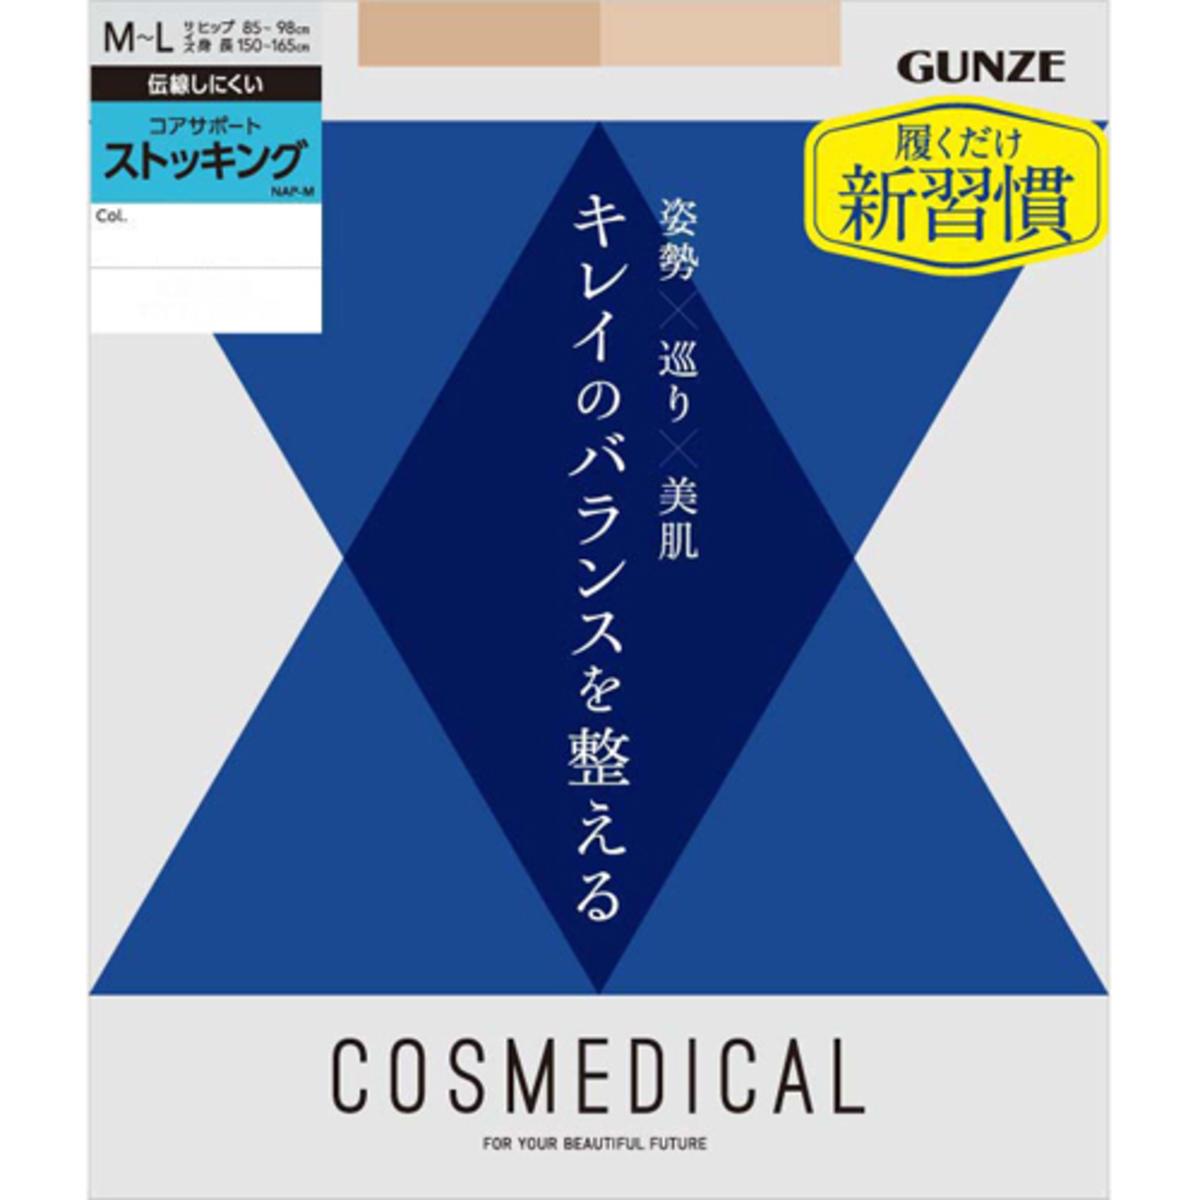 GUNZE COSMEDICAL CORE SUPPORT TIGHT BLACK 郡是   春夏用三效機能絲襪(日本製)  NA100  黑色 M-L(4547301030788)